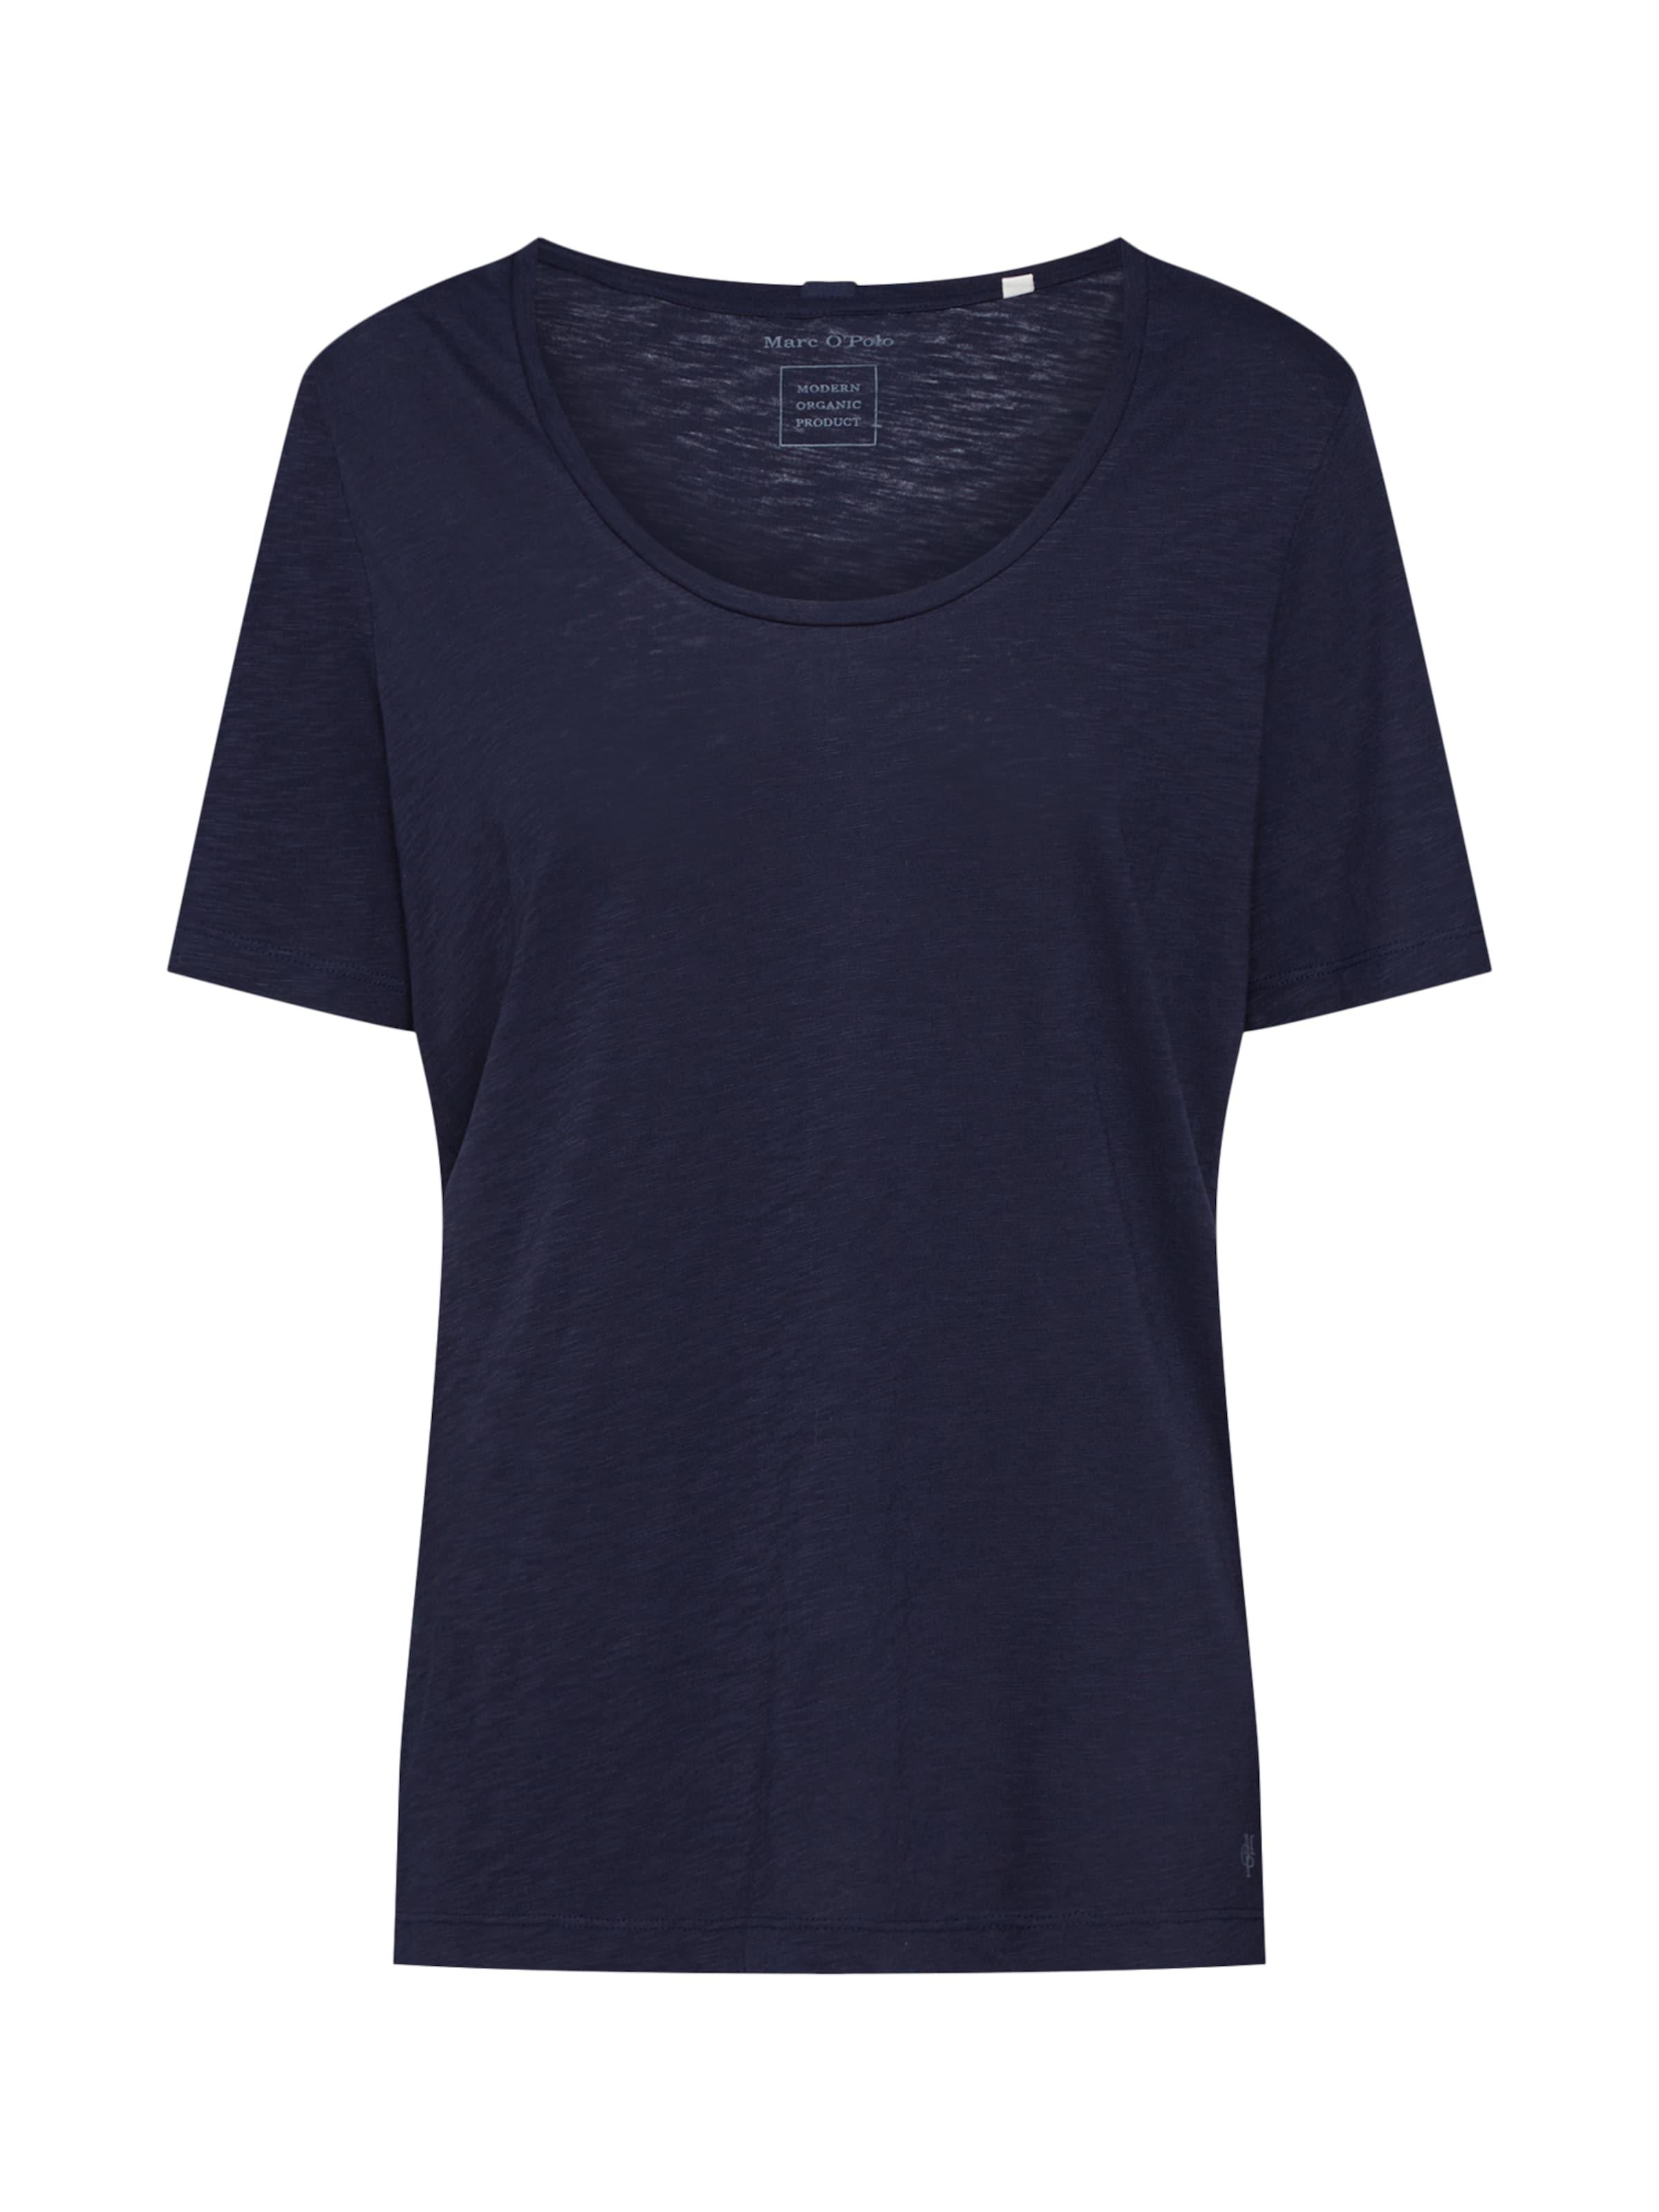 shirt O'polo En Marc T Rouge FTlK1Jc